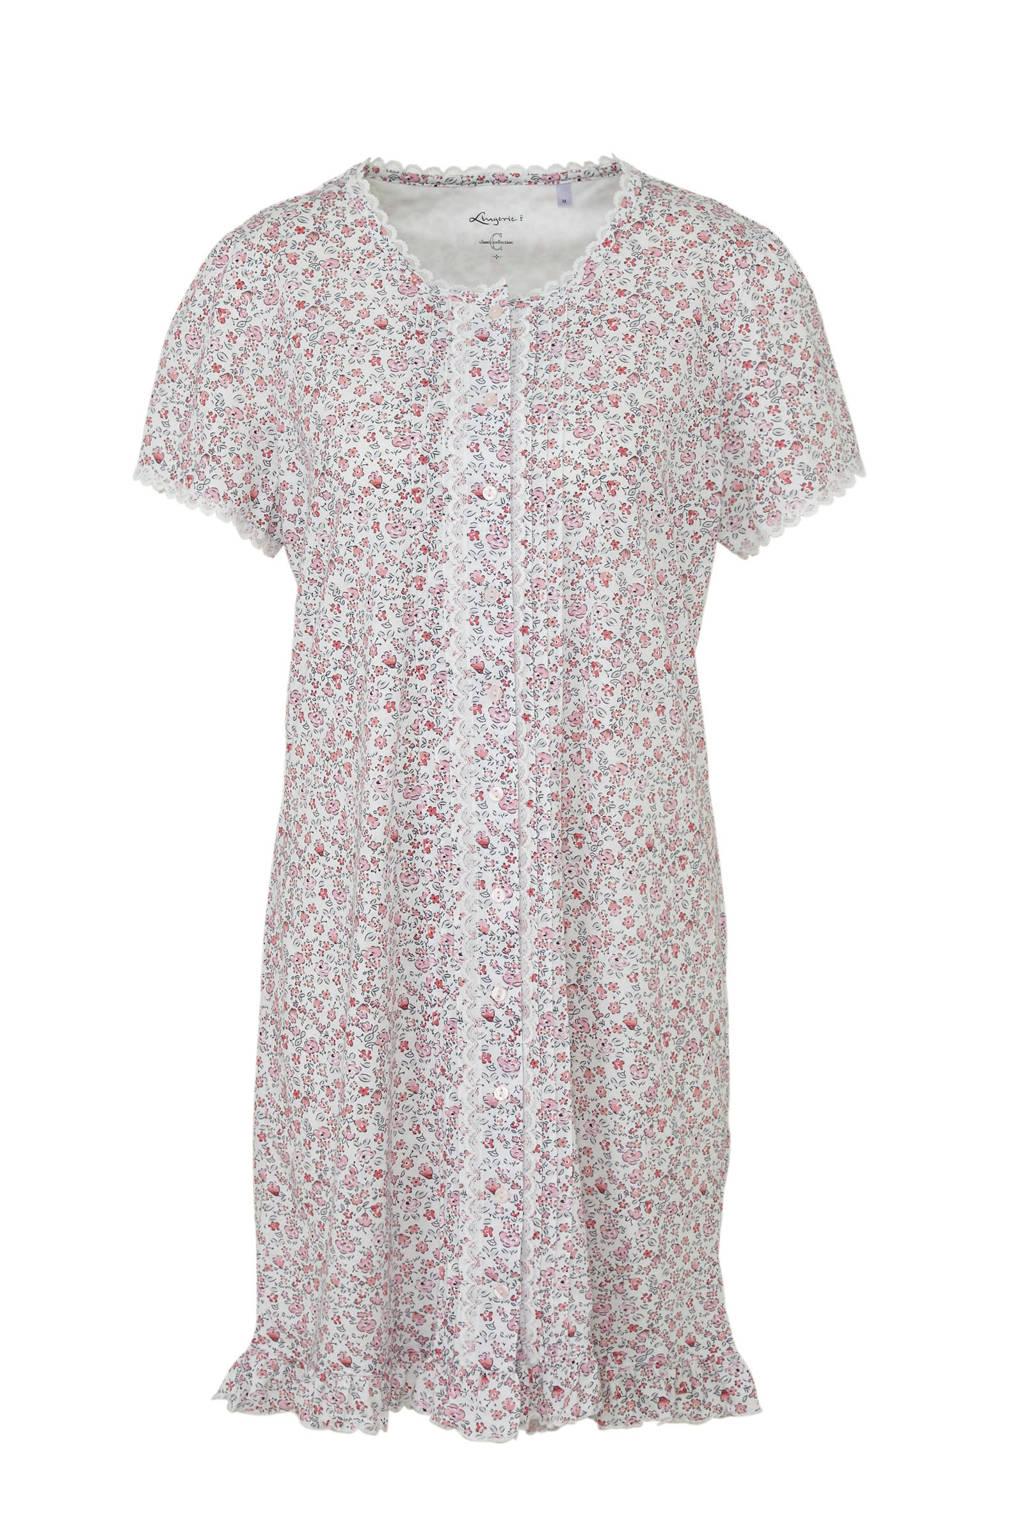 C&A nachthemd met all over bloemenprint roze/wit, Roze/wit